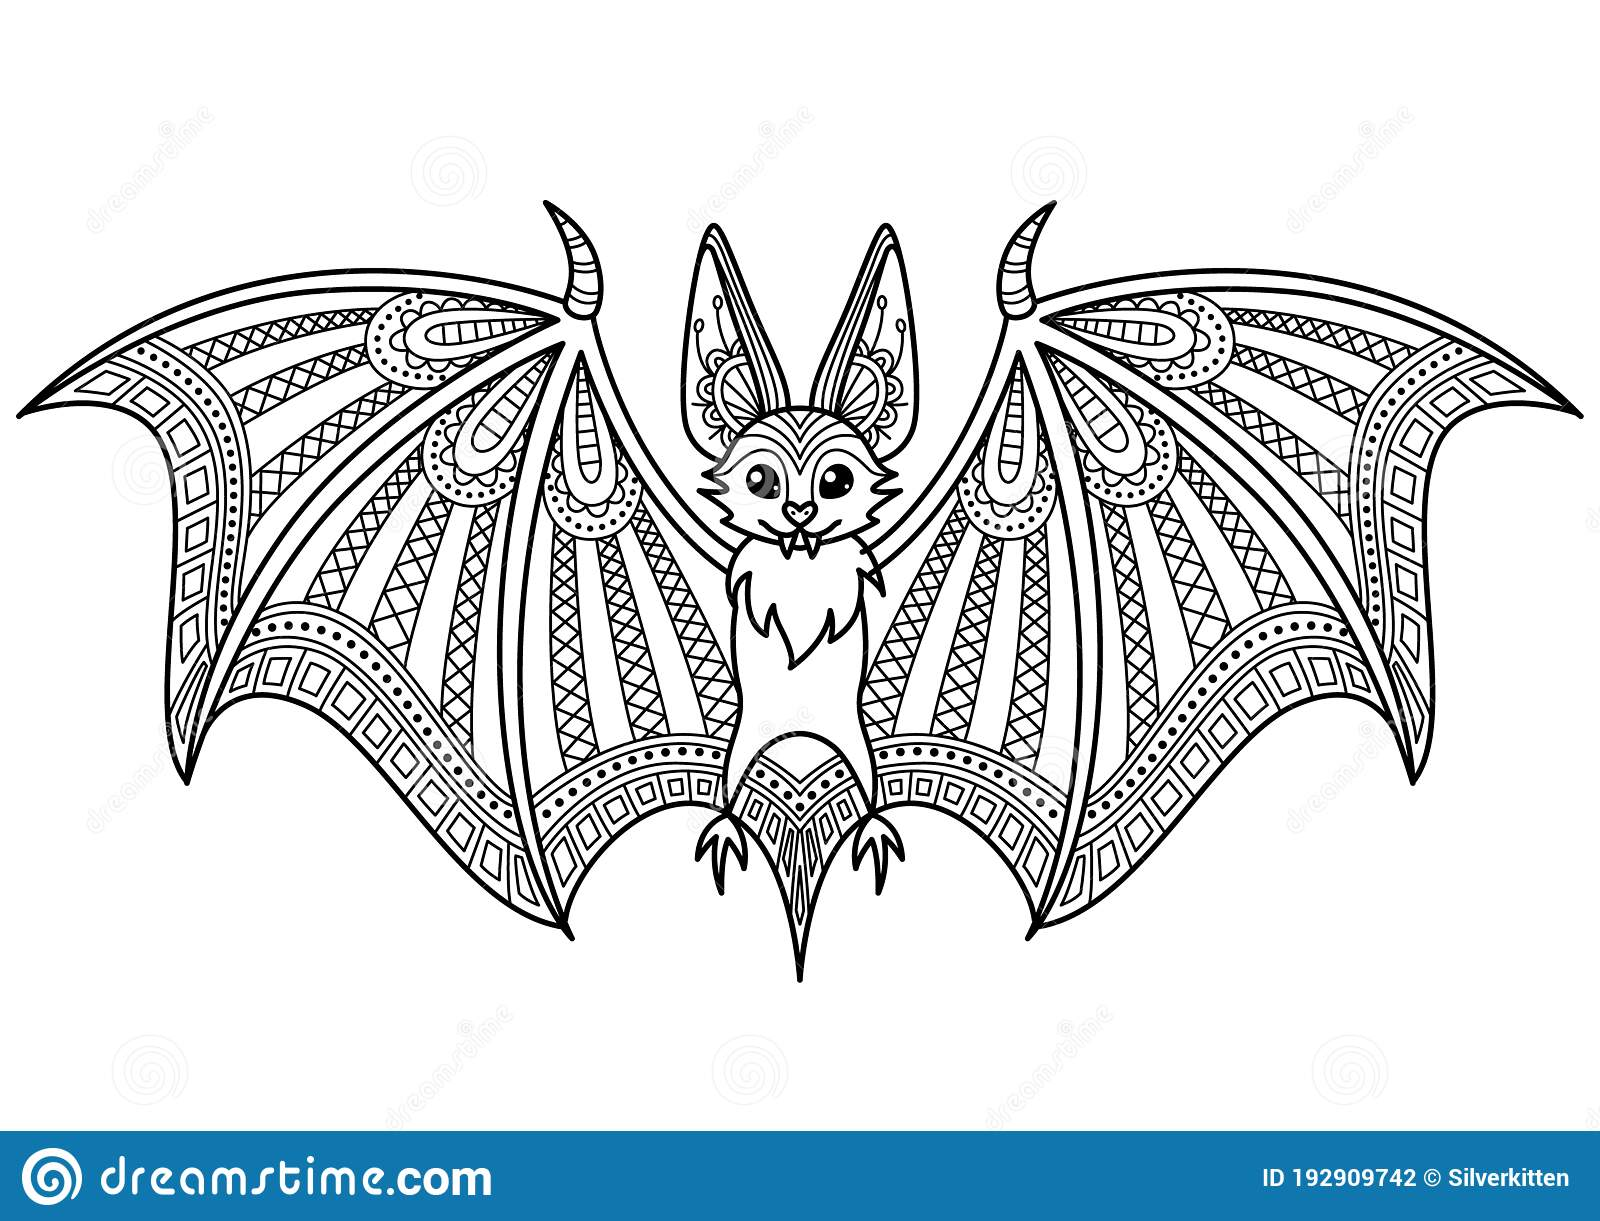 Halloween Bat Doodle Coloring Book Page Antistress For Adult Stock Illustration Illustration Of Night Flight 192909742